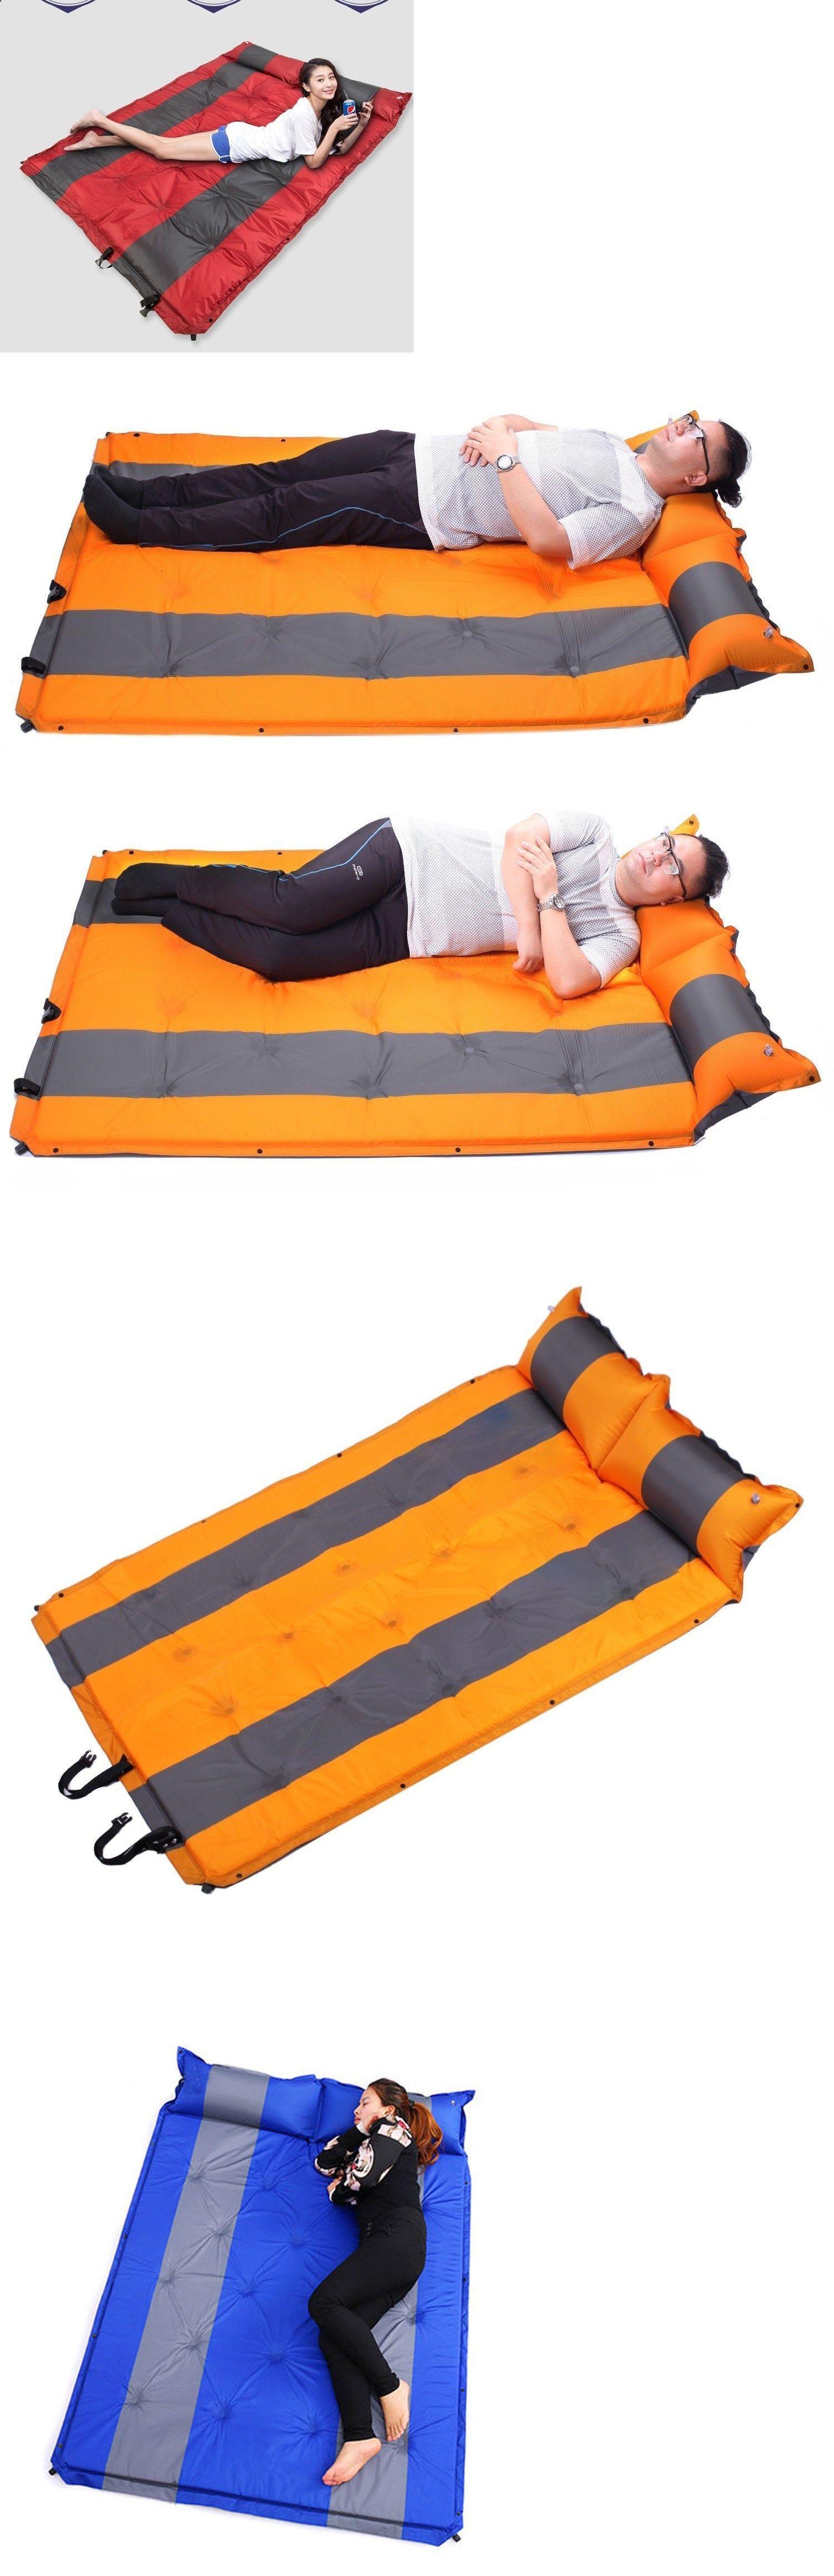 Camping Sleeping Pad - Mattresses and Pads 36114: Double Self Inflating Pad  Sleeping Mattress Air